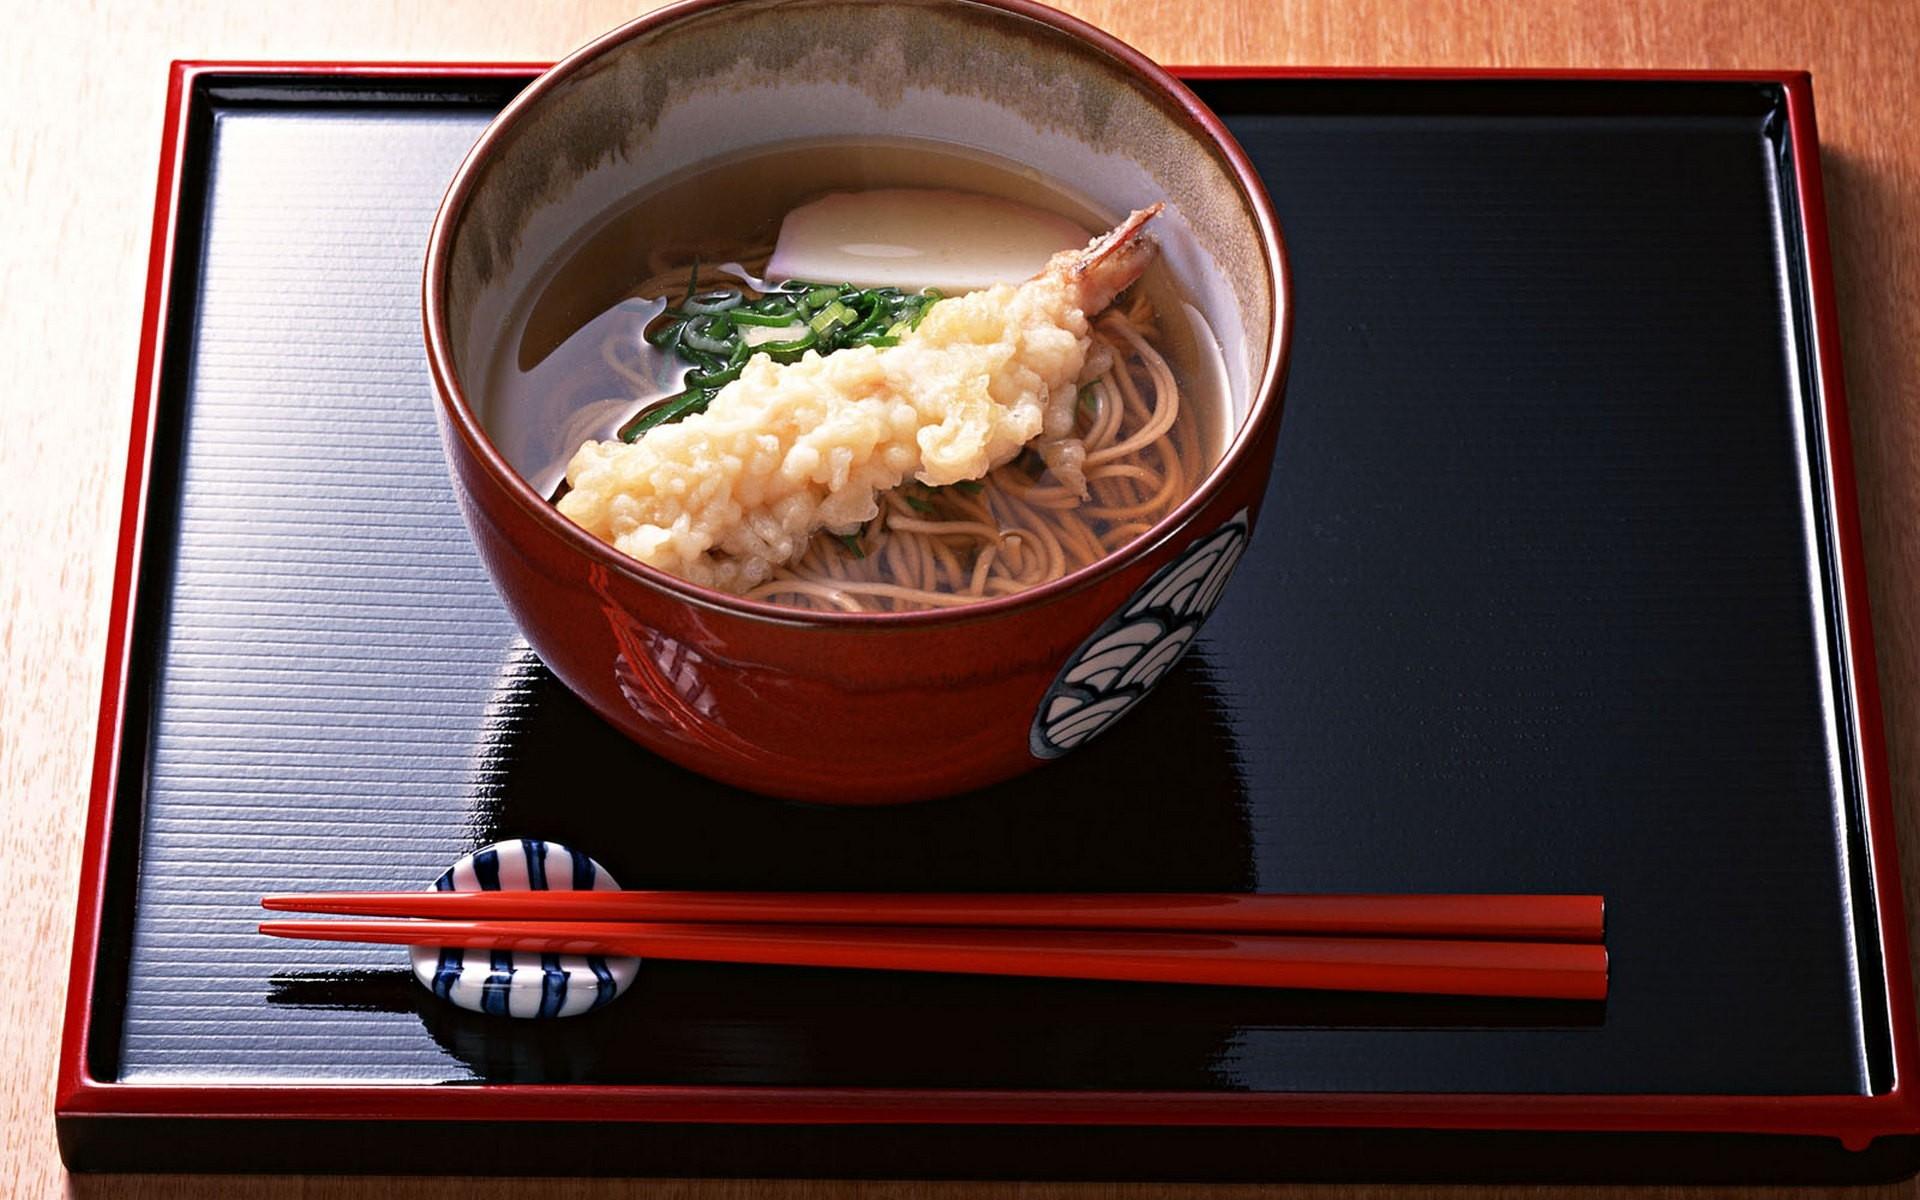 Wallpaper Meat Noodle Noodles Meal Dish Produce